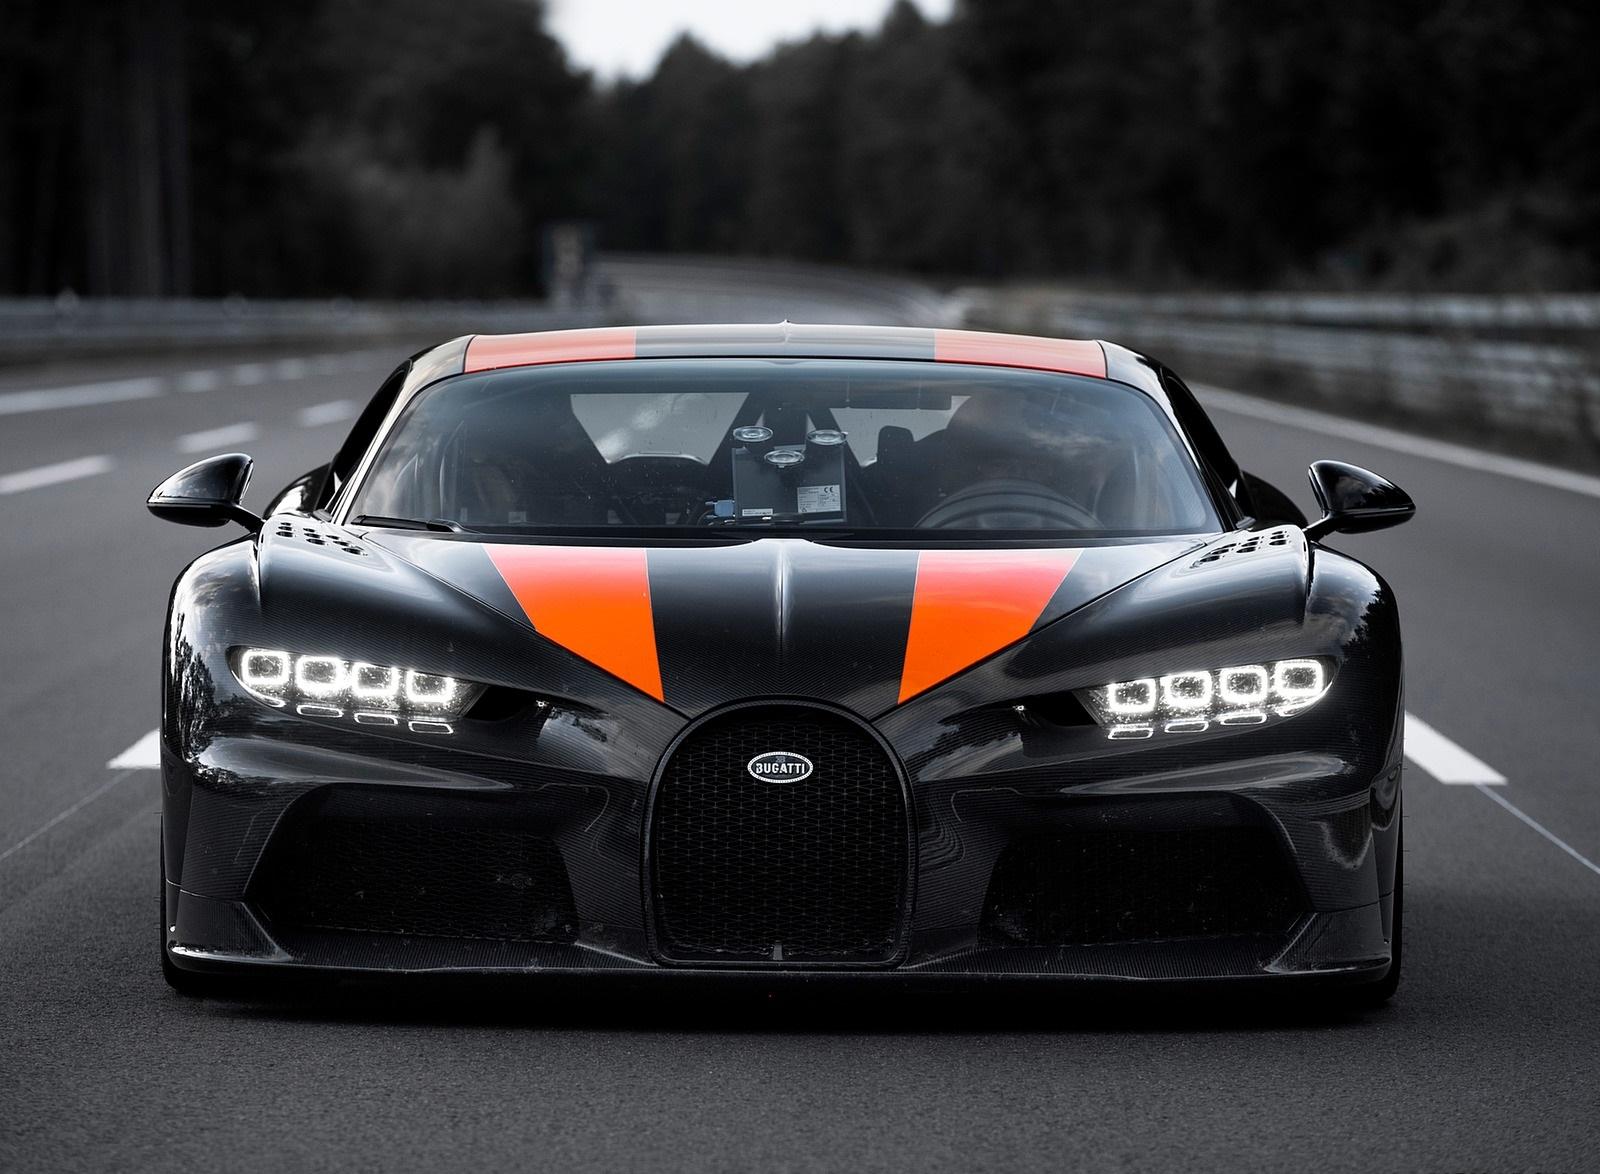 2021 Bugatti Chiron Super Sport 300+ Front Wallpapers (10)